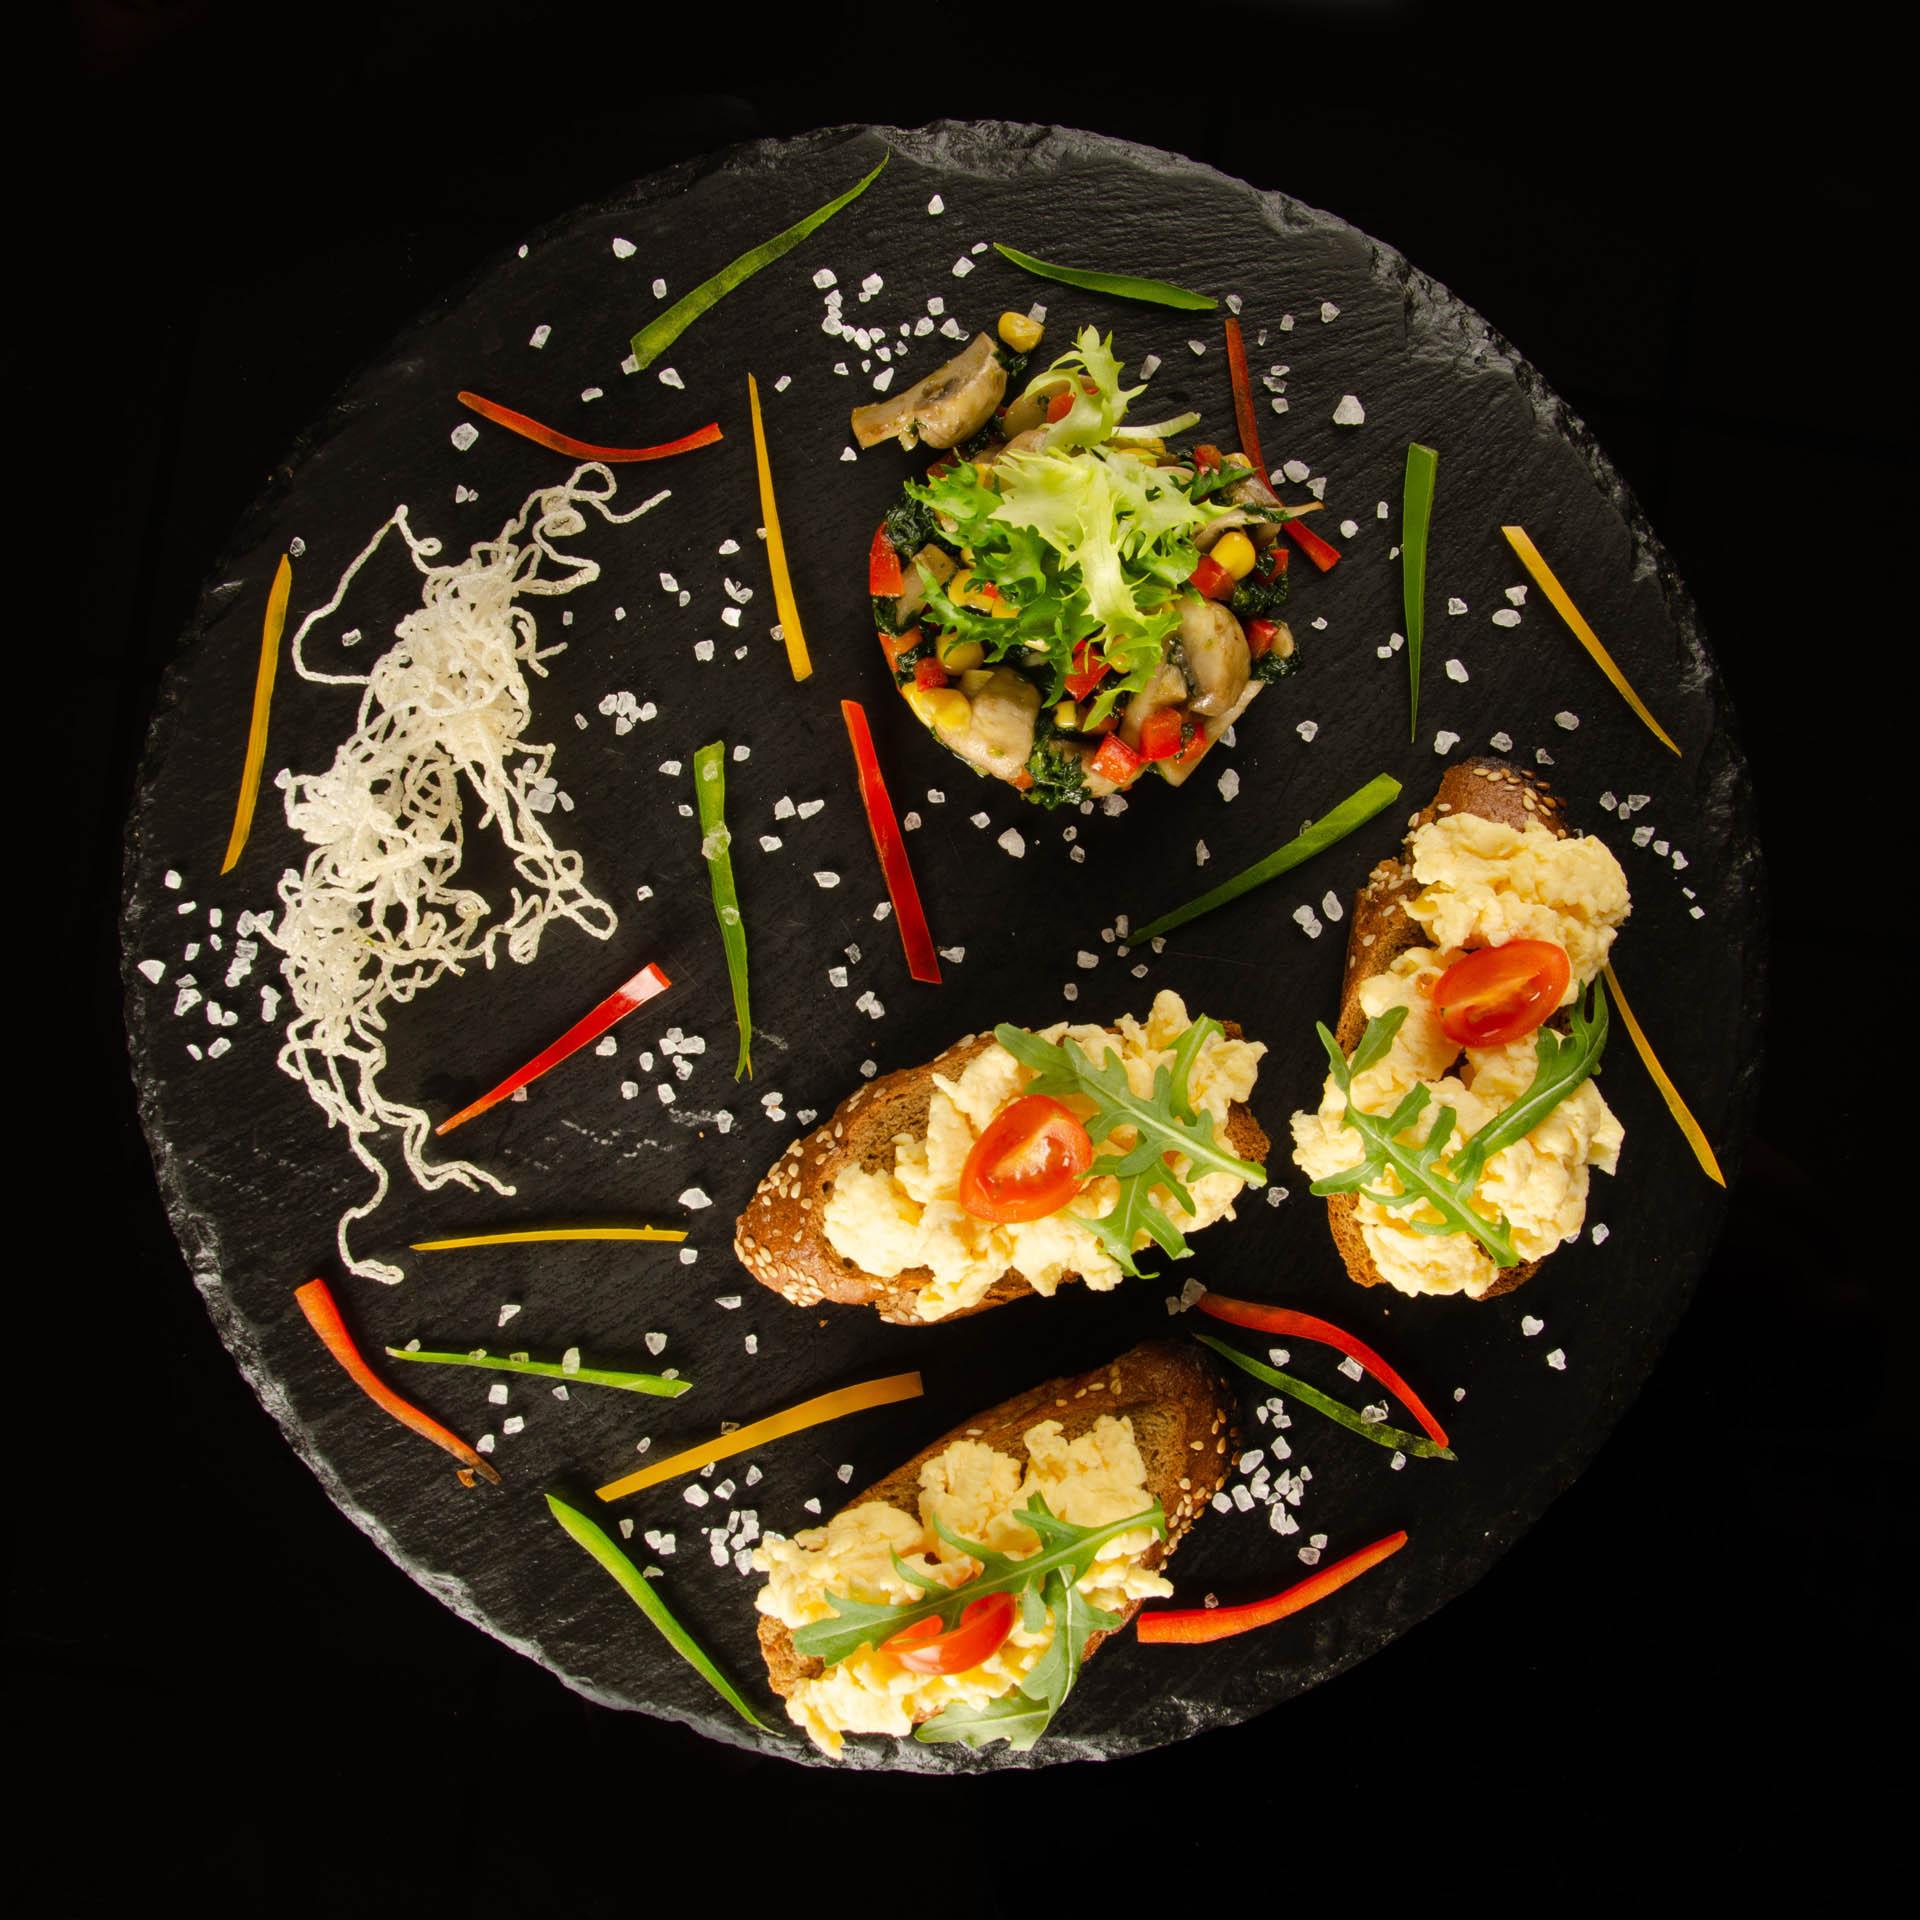 Testo Cafe Food Photo